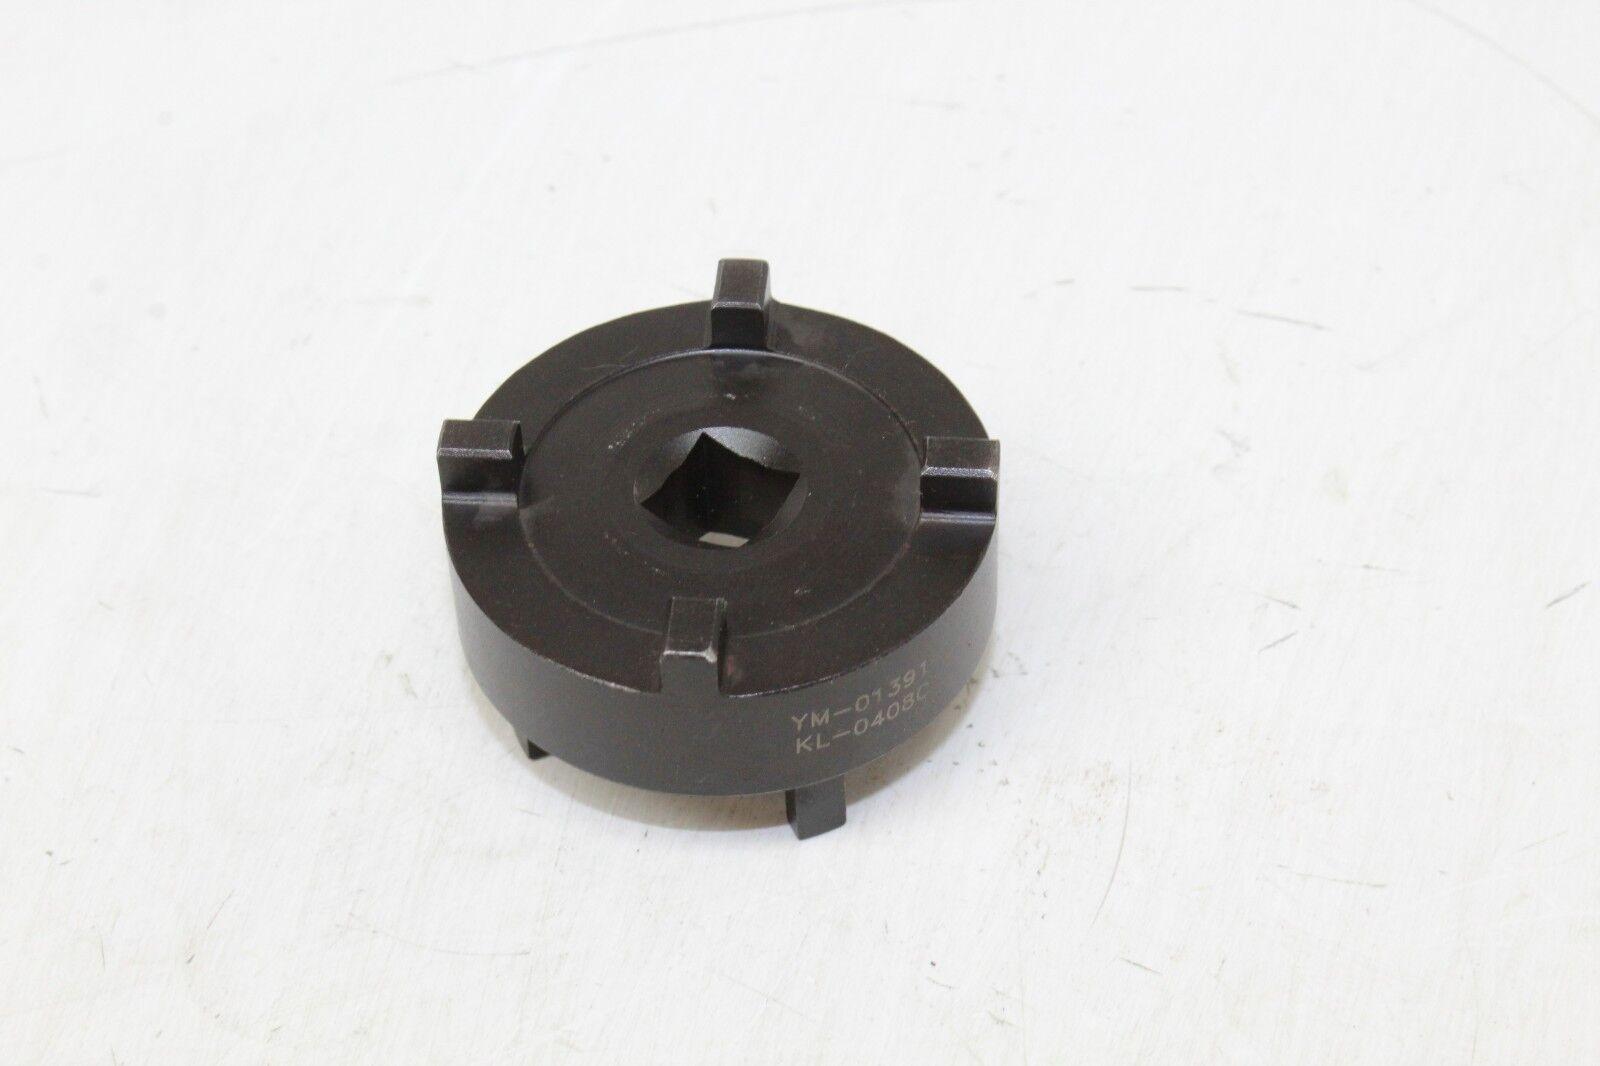 Yamaha ATV Ring Nut Wrench OEM YM-01391 KL-0408C